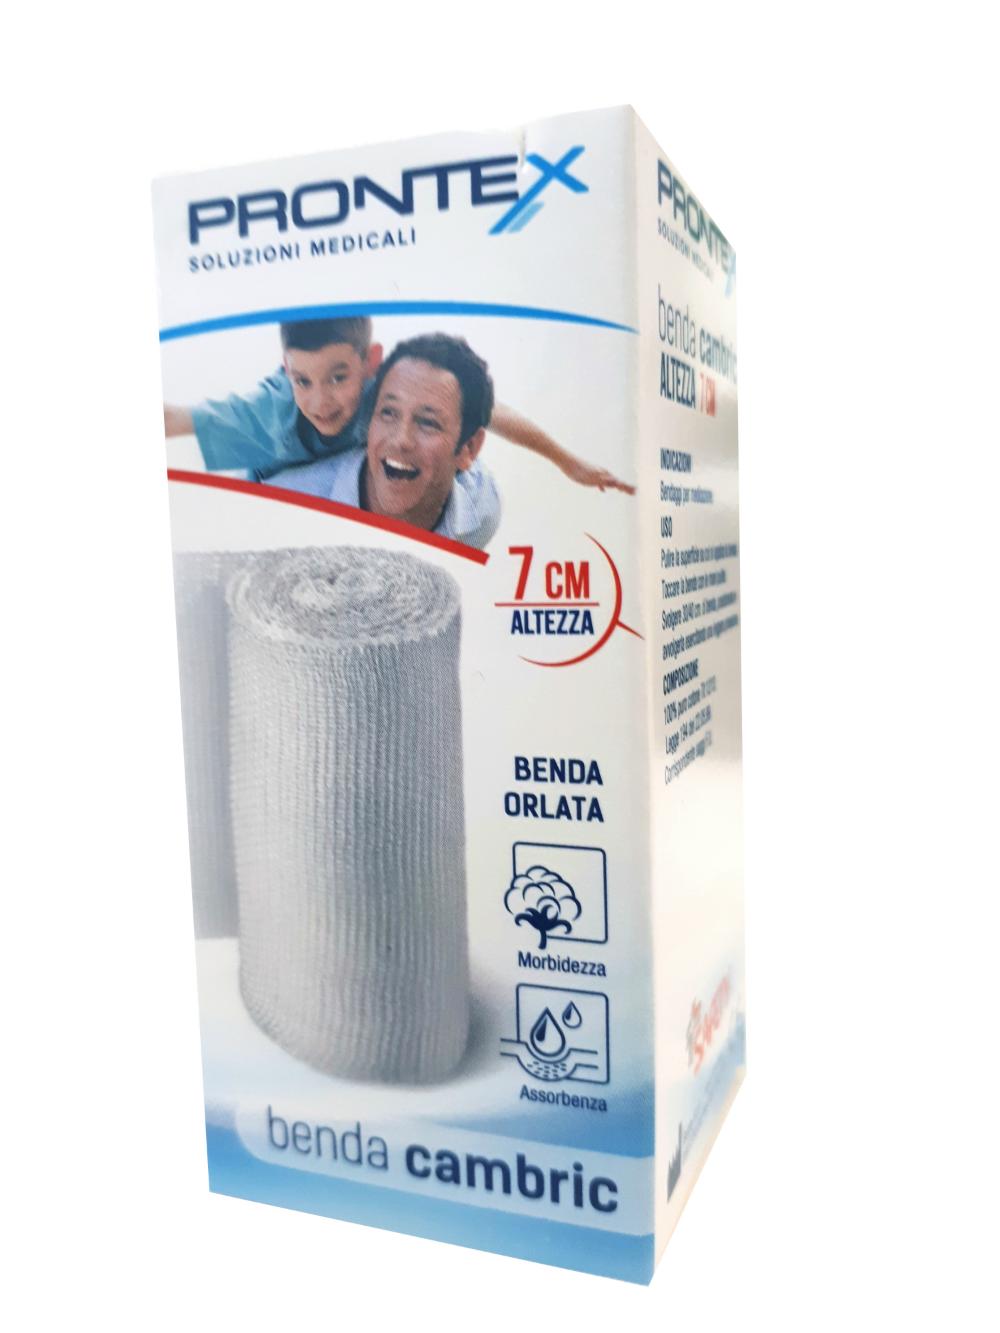 Safety Prontex Cambric benda orlata H7cm